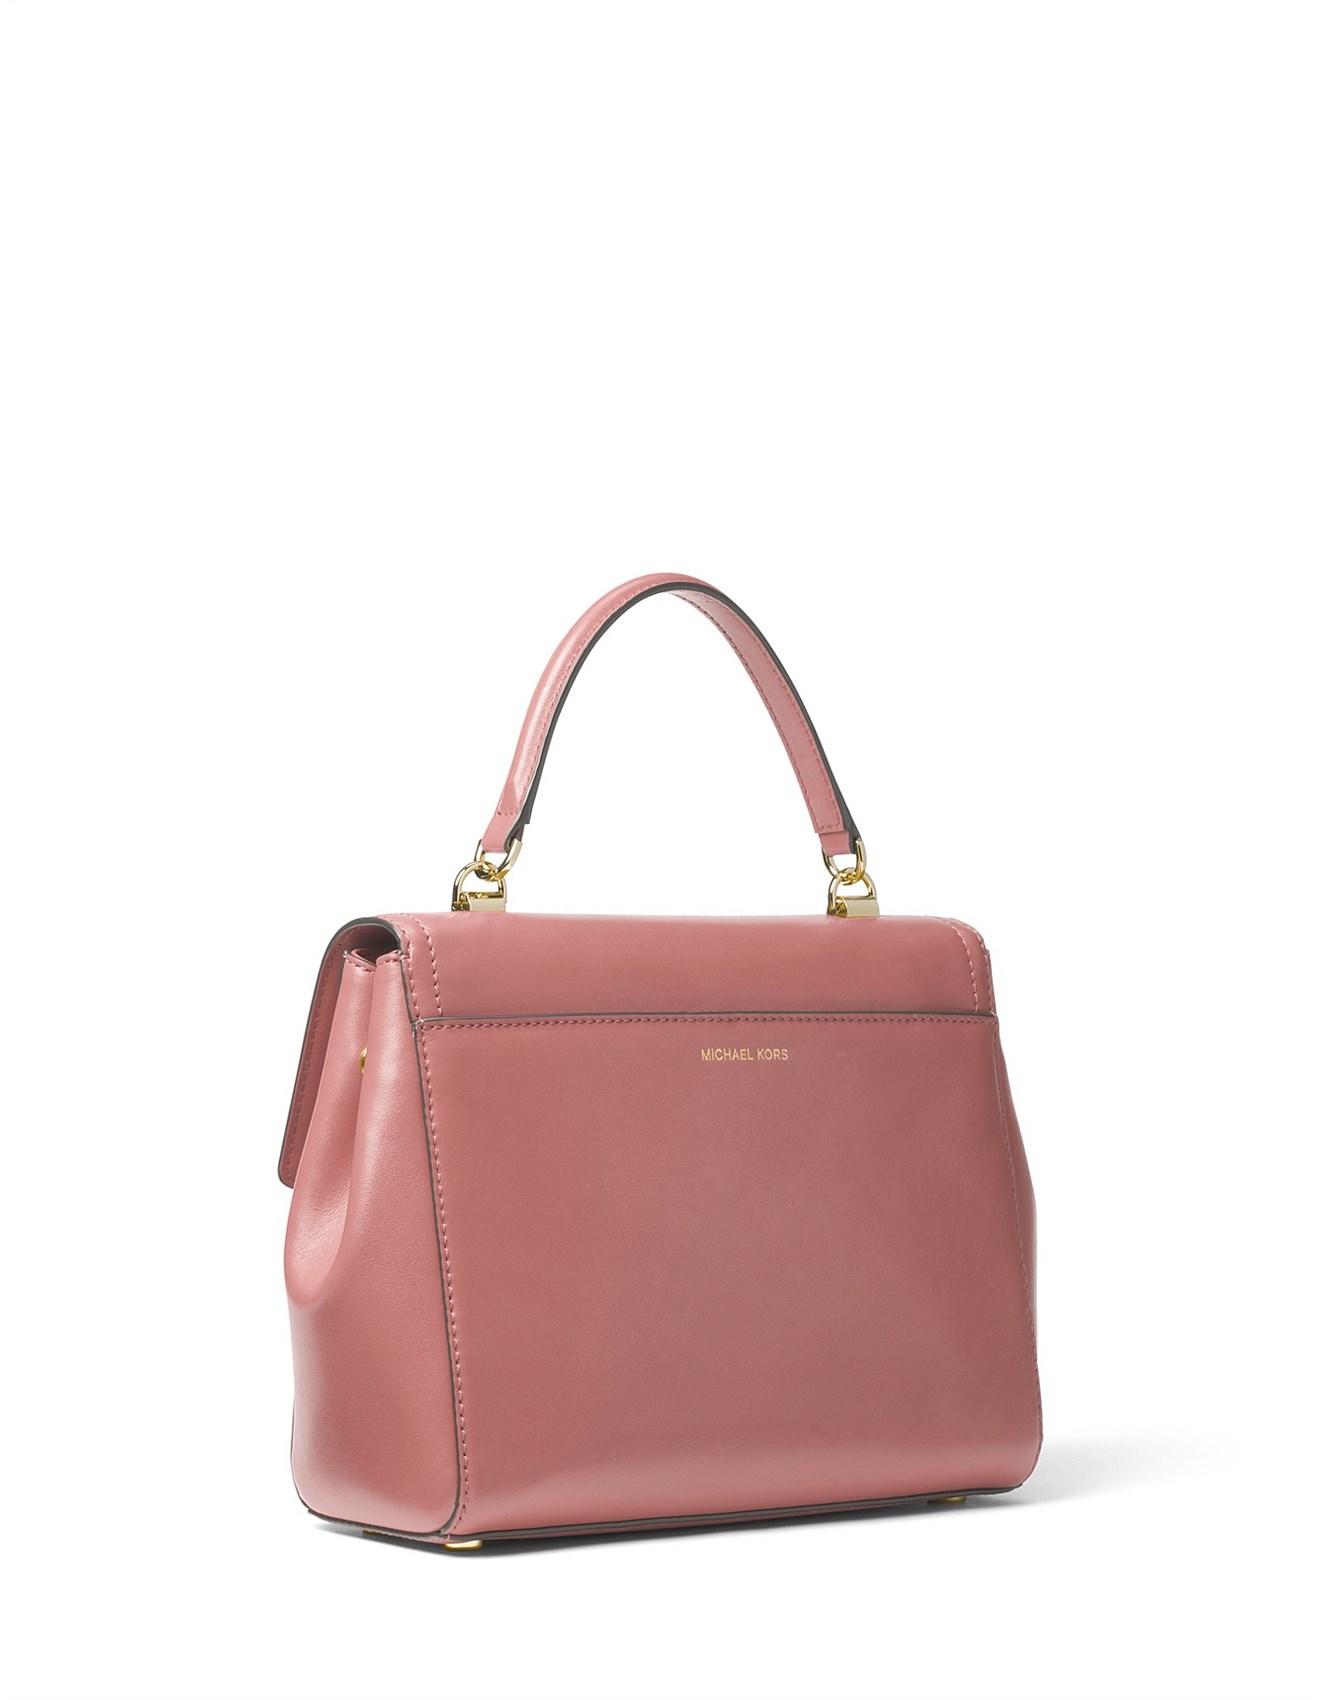 ac6cf7854154 Michael Kors   Handbags, Watches & More Online   David Jones - Ava ...